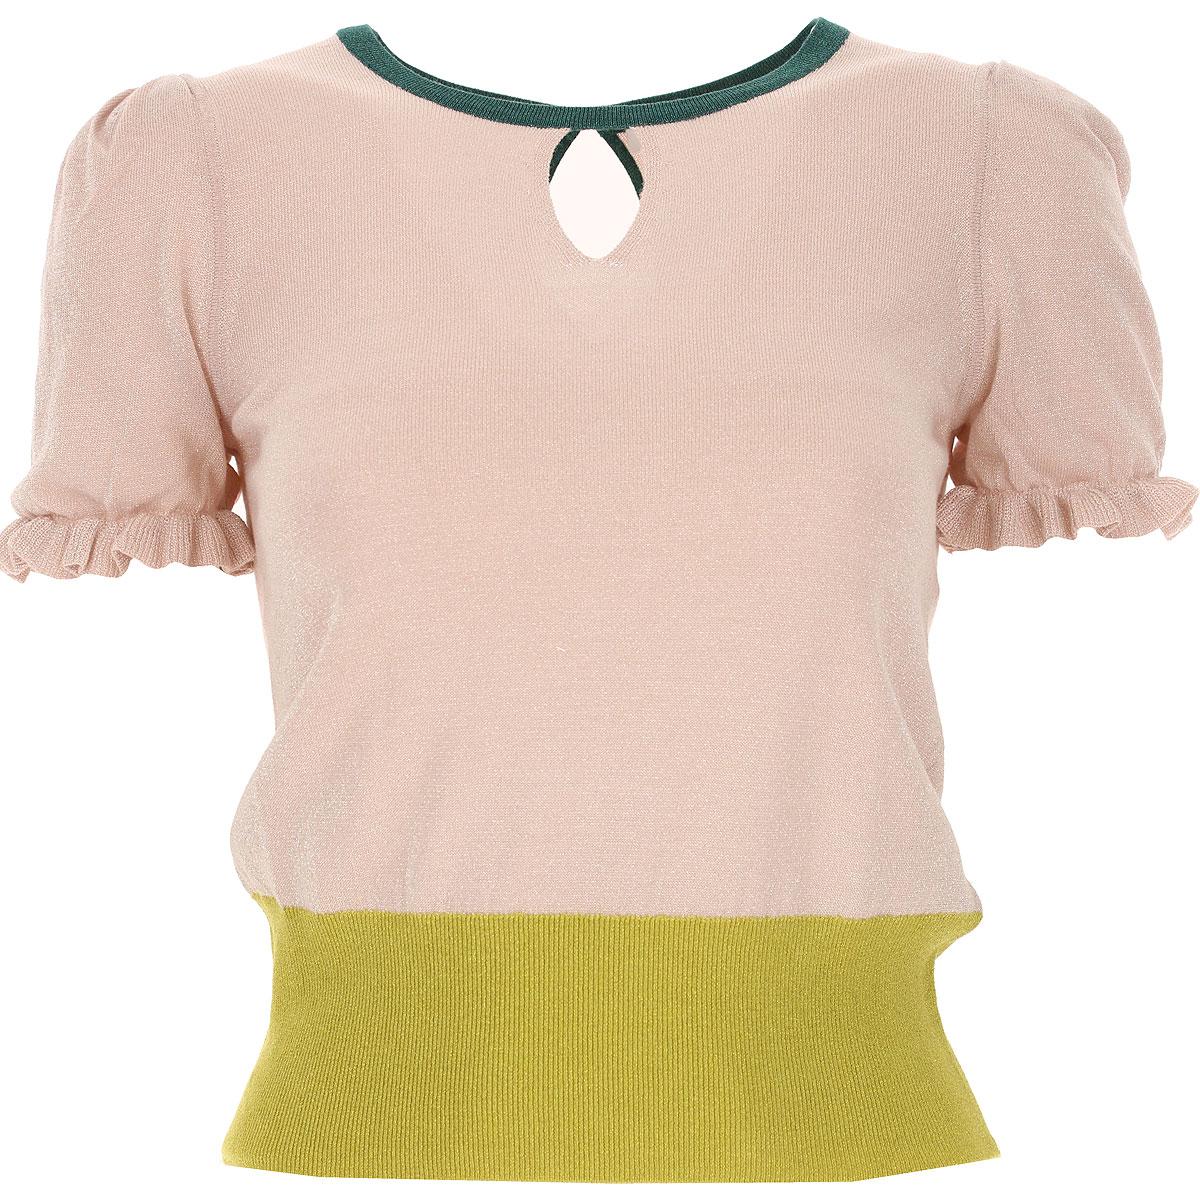 6b786a3d5c1bba Womens Clothing Patrizia Pepe, Style code: 8m0639-a1qza-f3r5